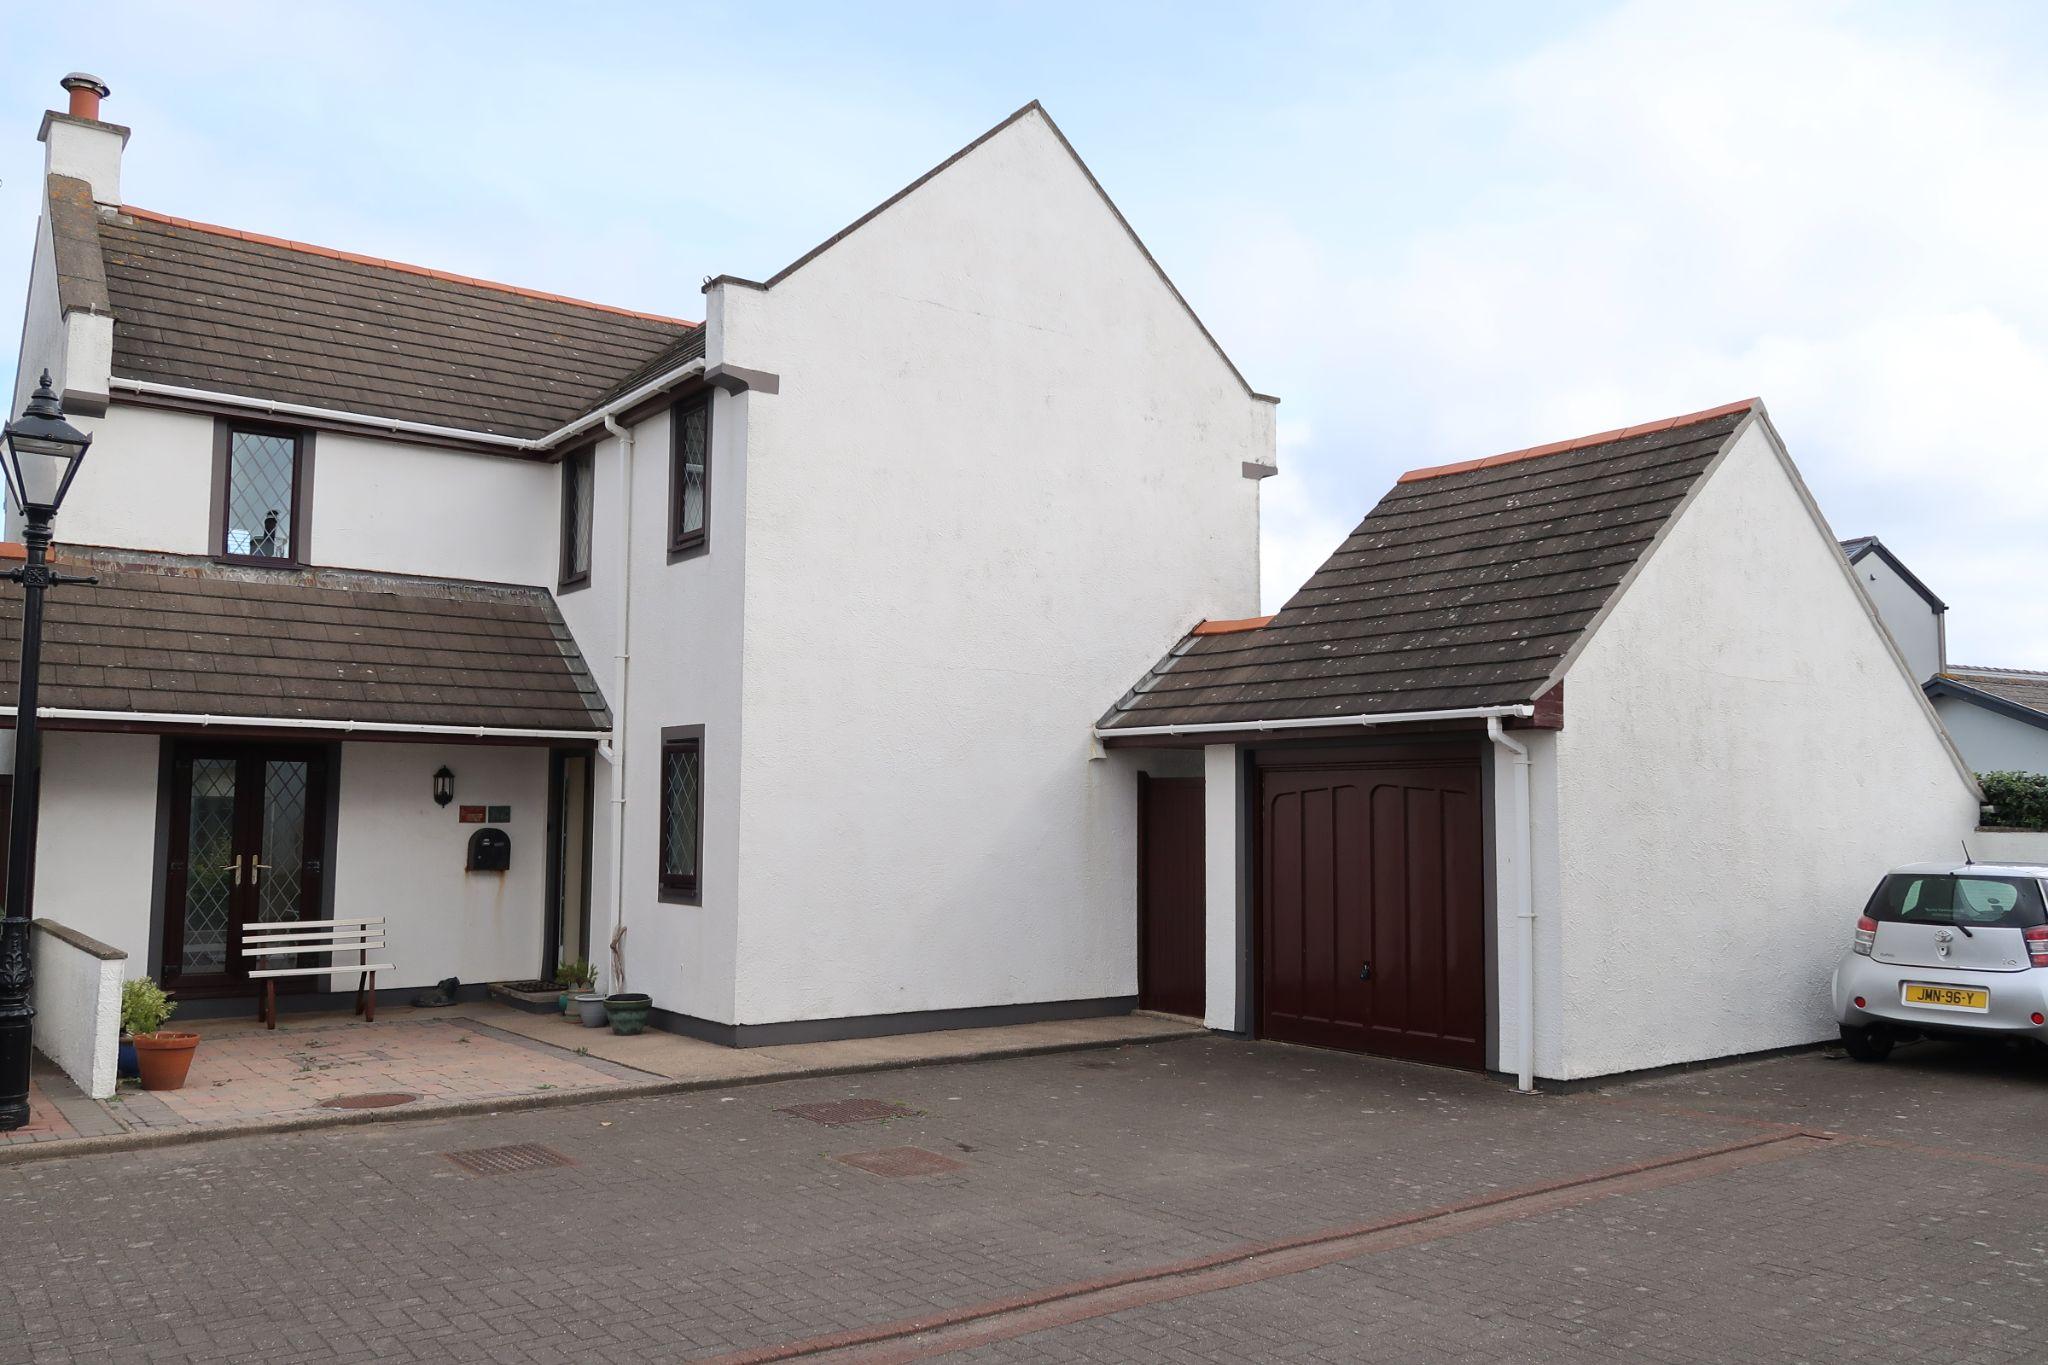 3 bedroom link detached house For Sale in Castletown - Photograph 7